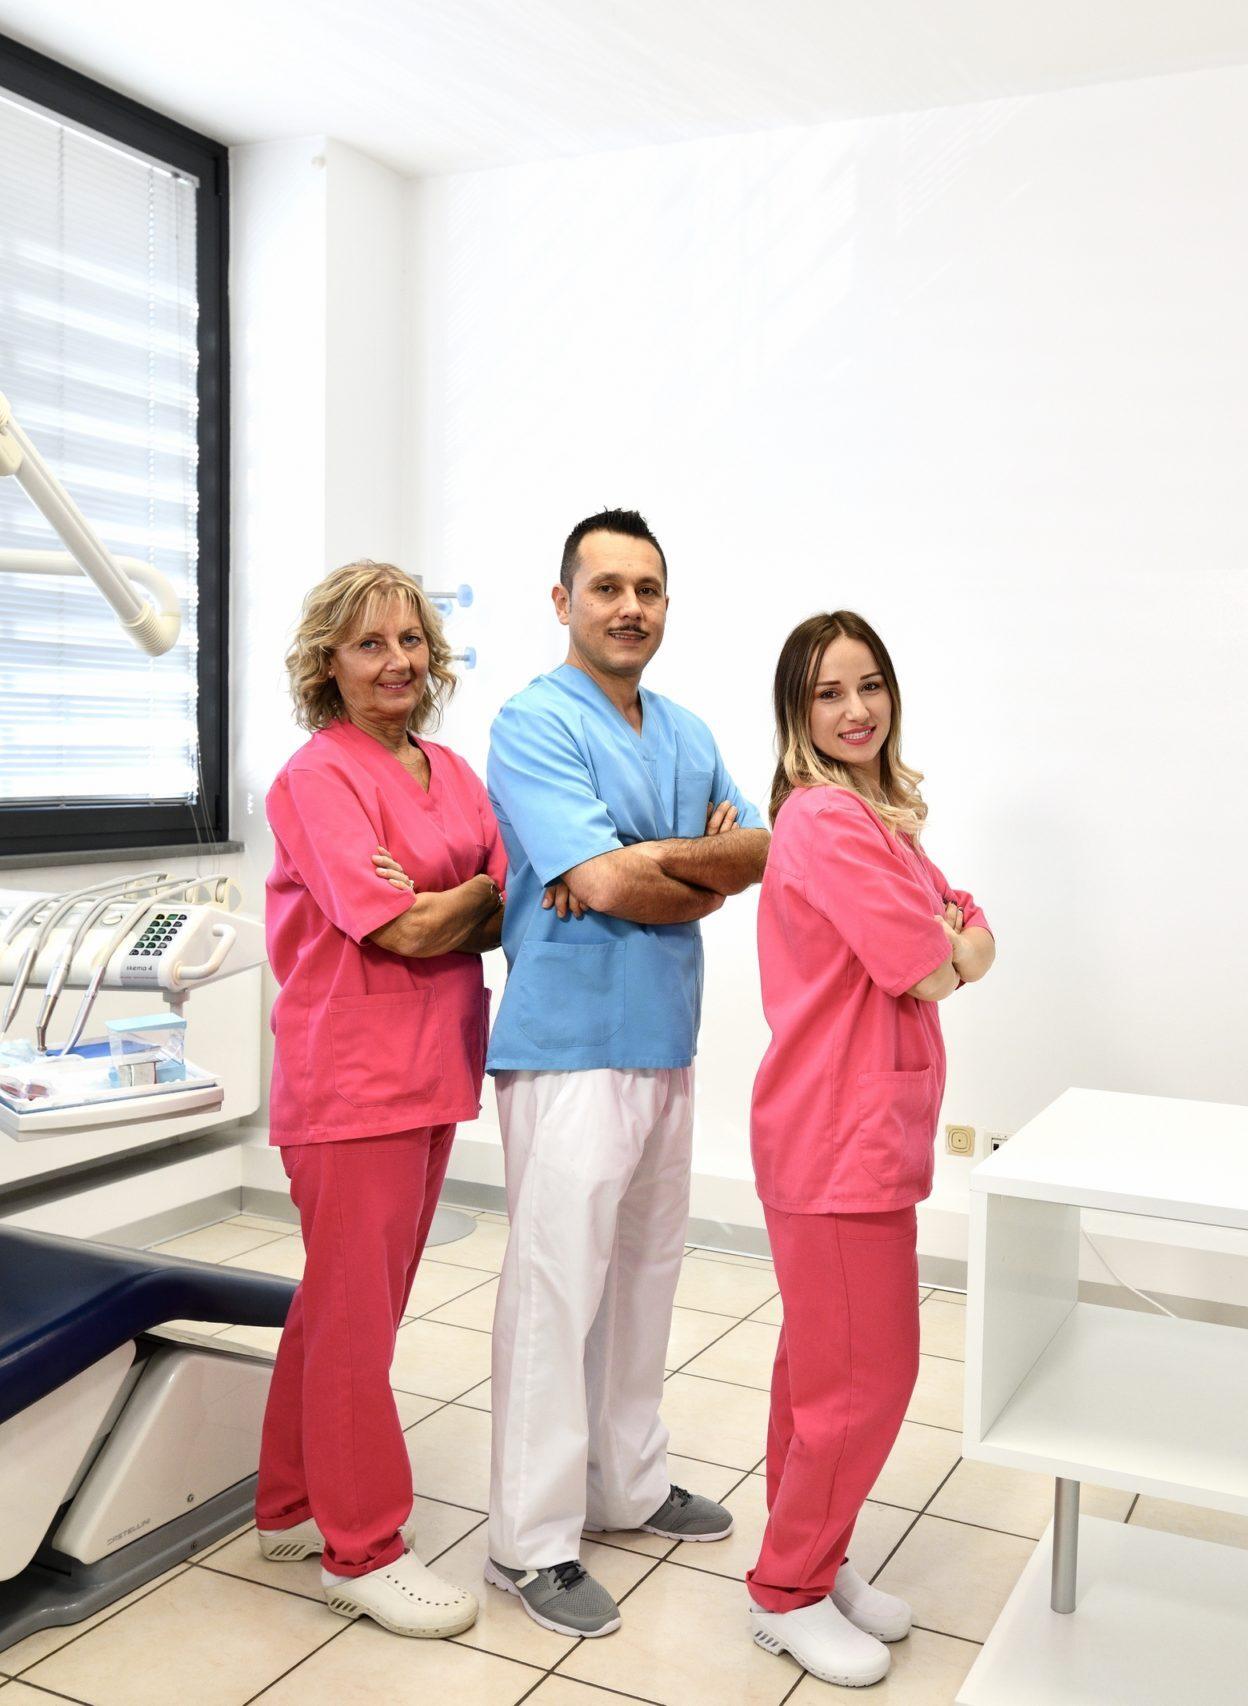 Studio Dentistico Mauro Montanari a Ravenna